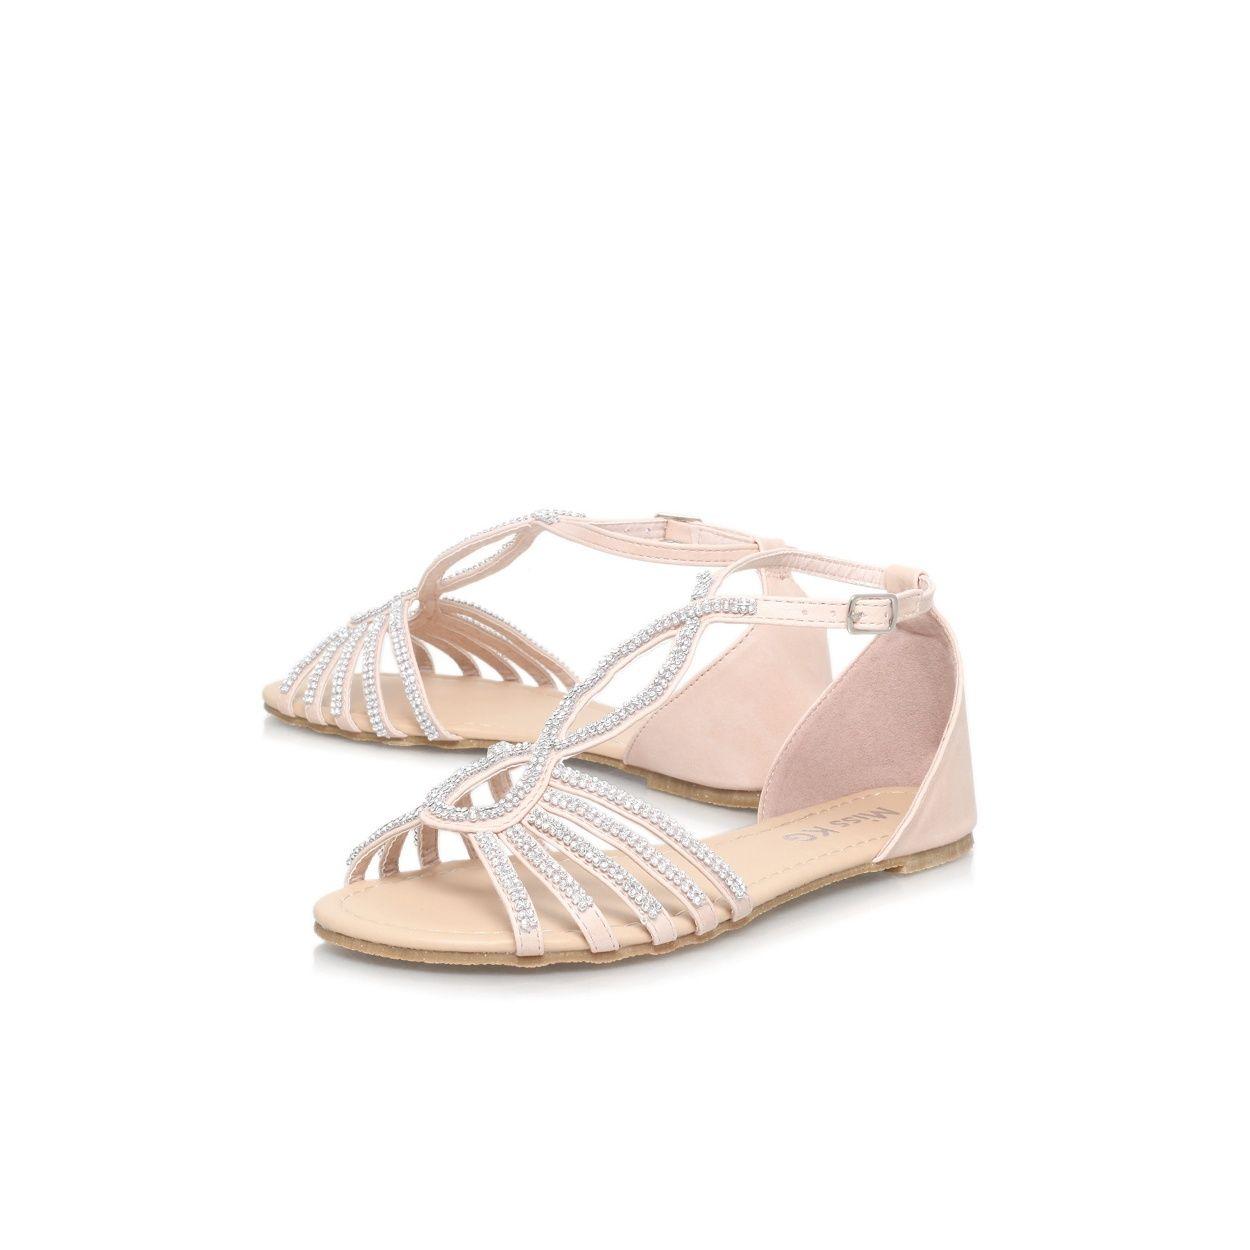 Women's sandals debenhams - Miss Kg Nude Rada Flat Sandal At Debenhams Com